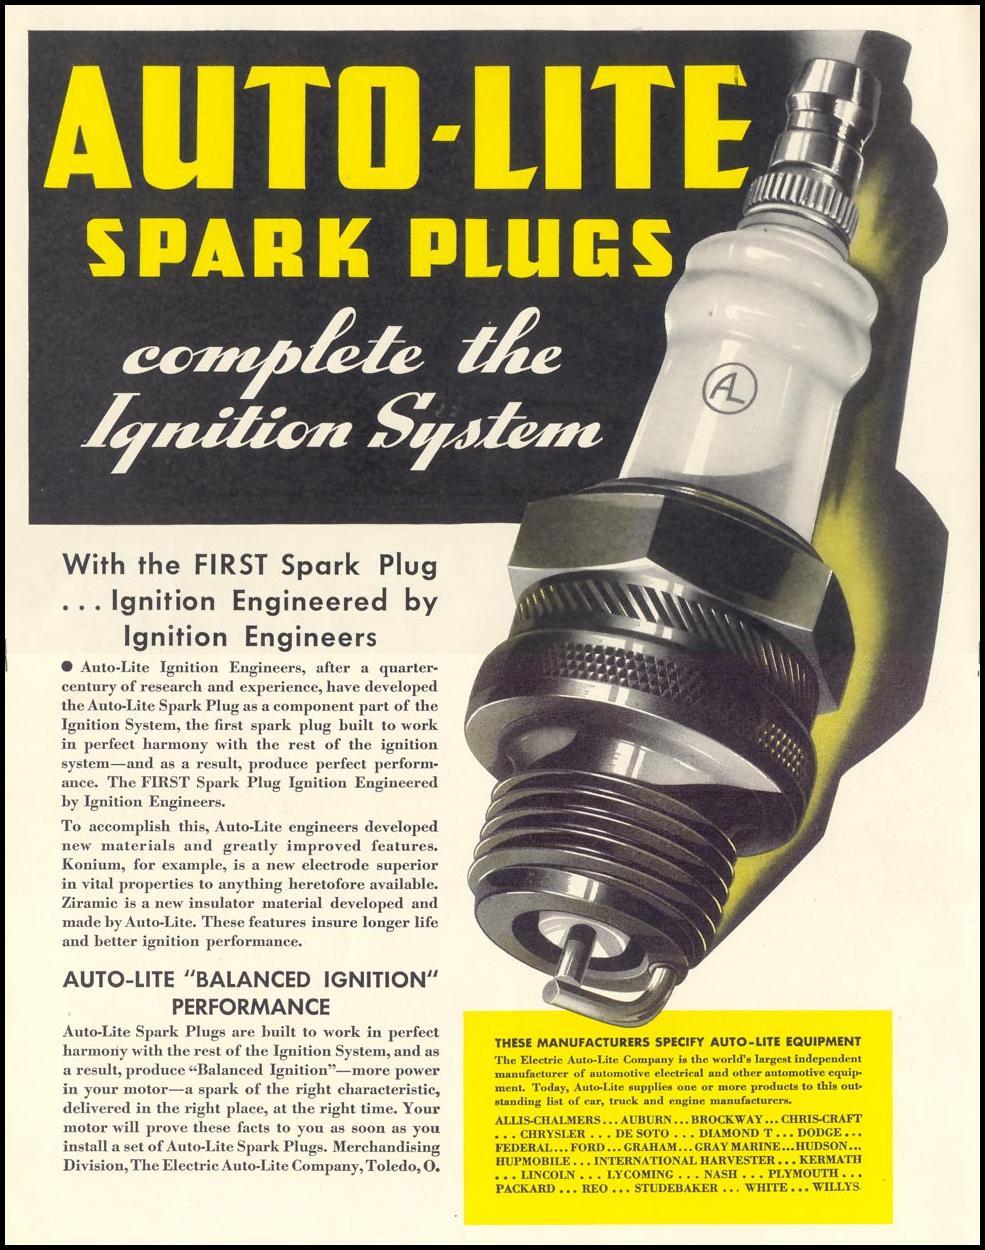 AUTO-LITE SPARK PLUGS LIFE 07/26/1937